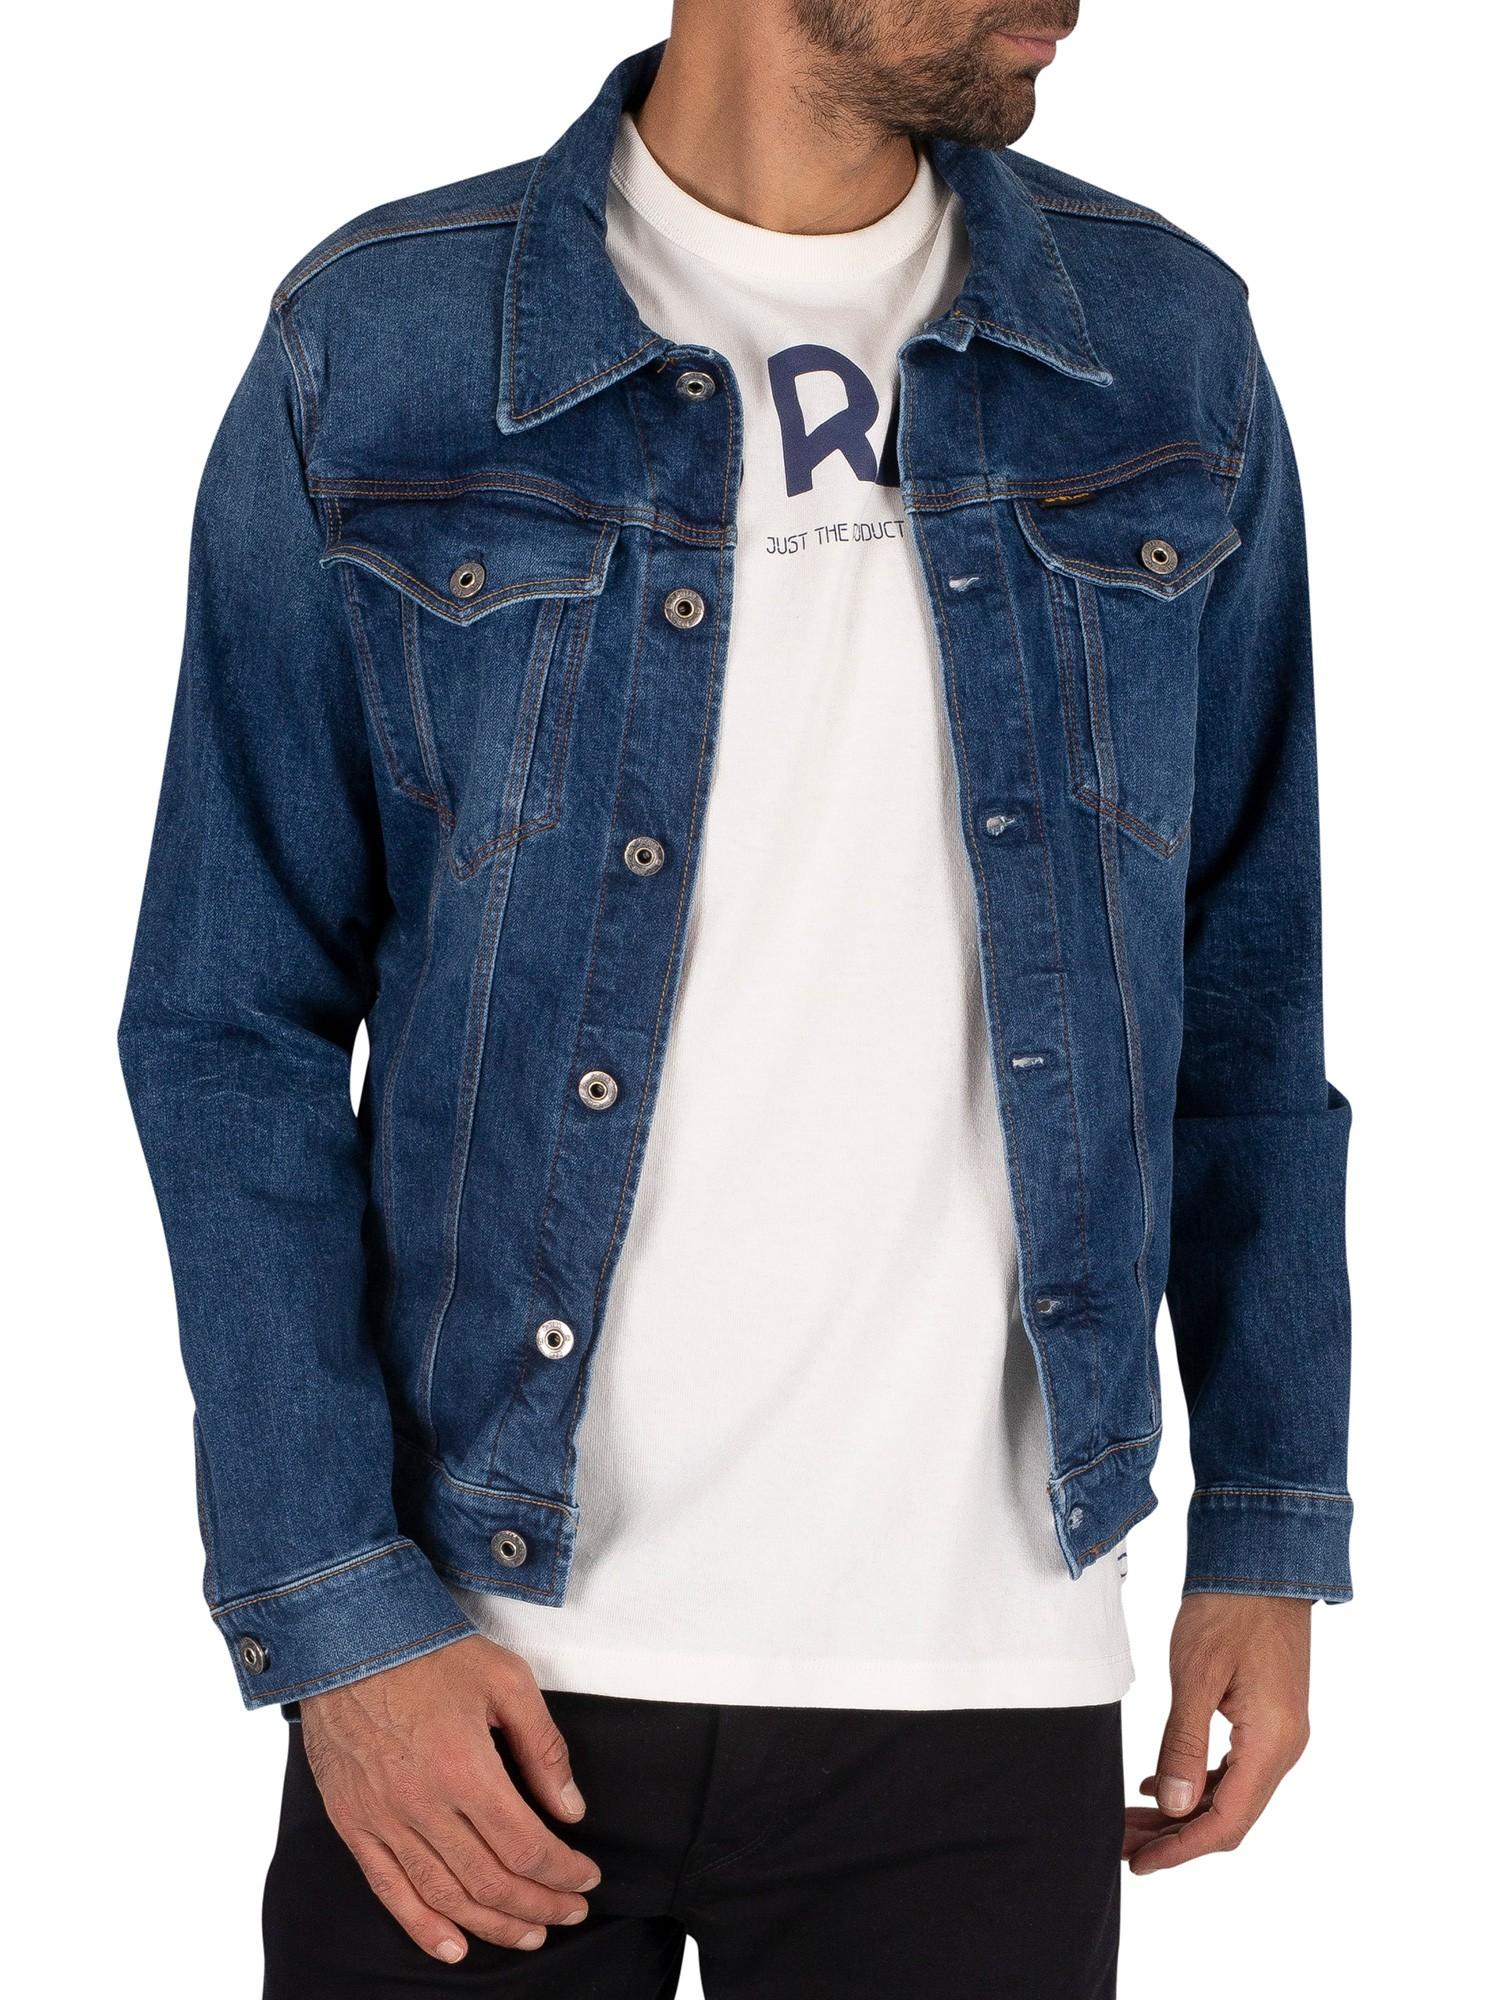 3301-Slim-Denim-Jacket